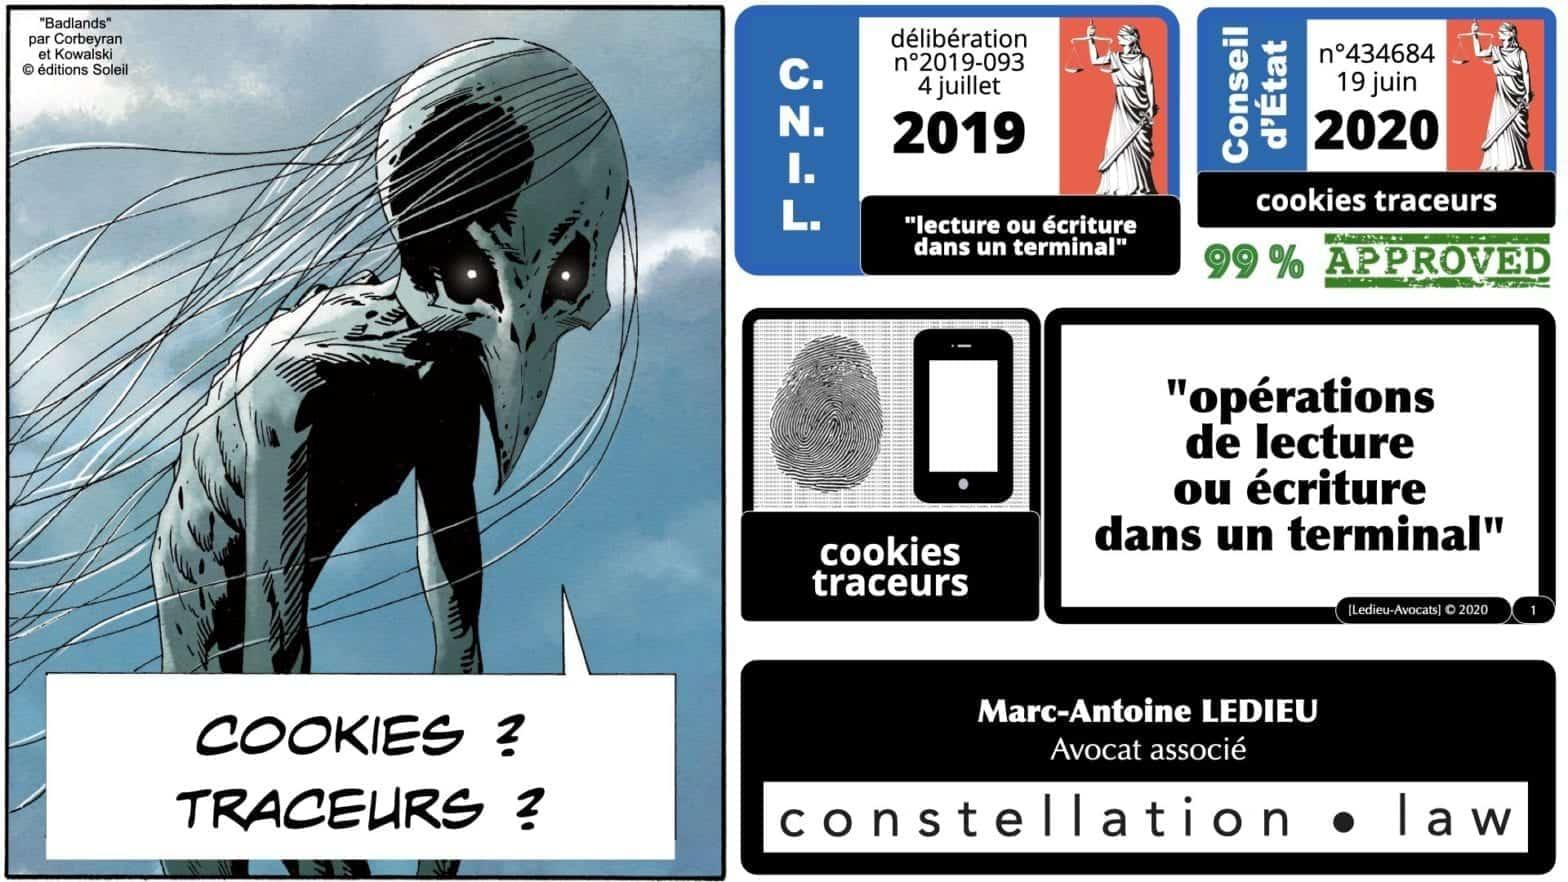 cookies traceurs ? analyse Conseil d'Etat 19 juin 2020